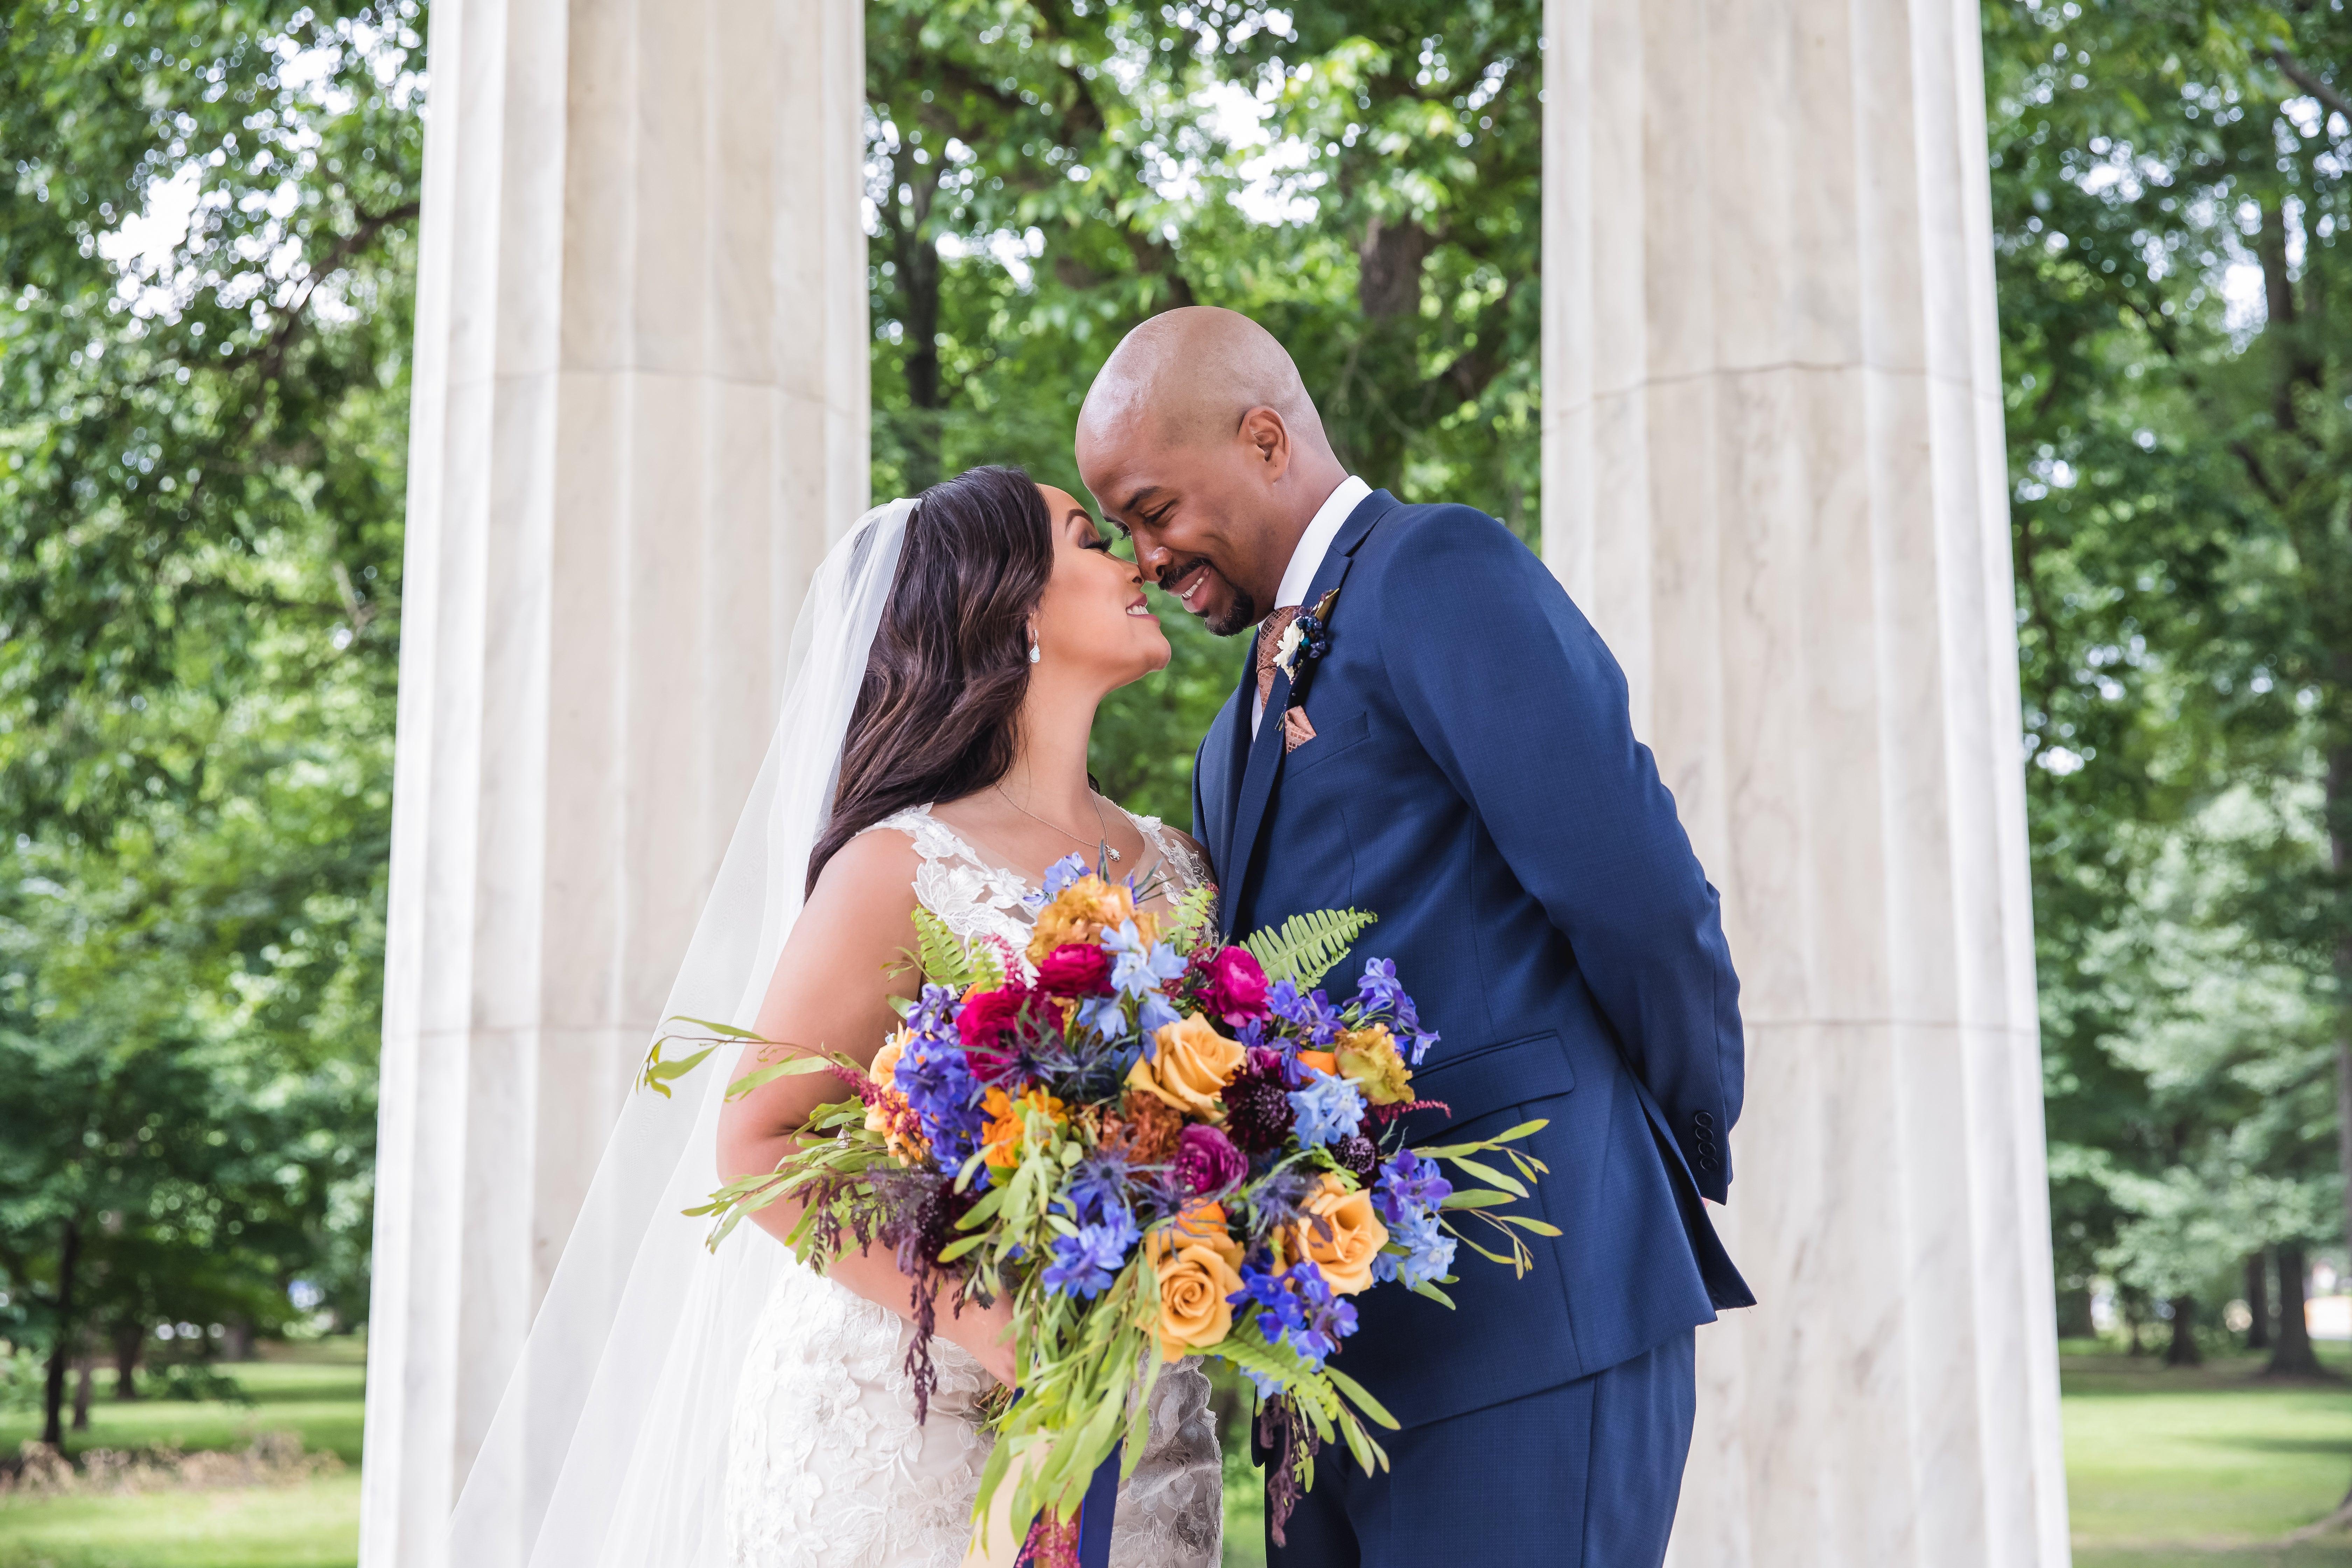 Bridal Bliss: Miya and Brandon's Washington, D.C., Wedding Had A Vintage Feel